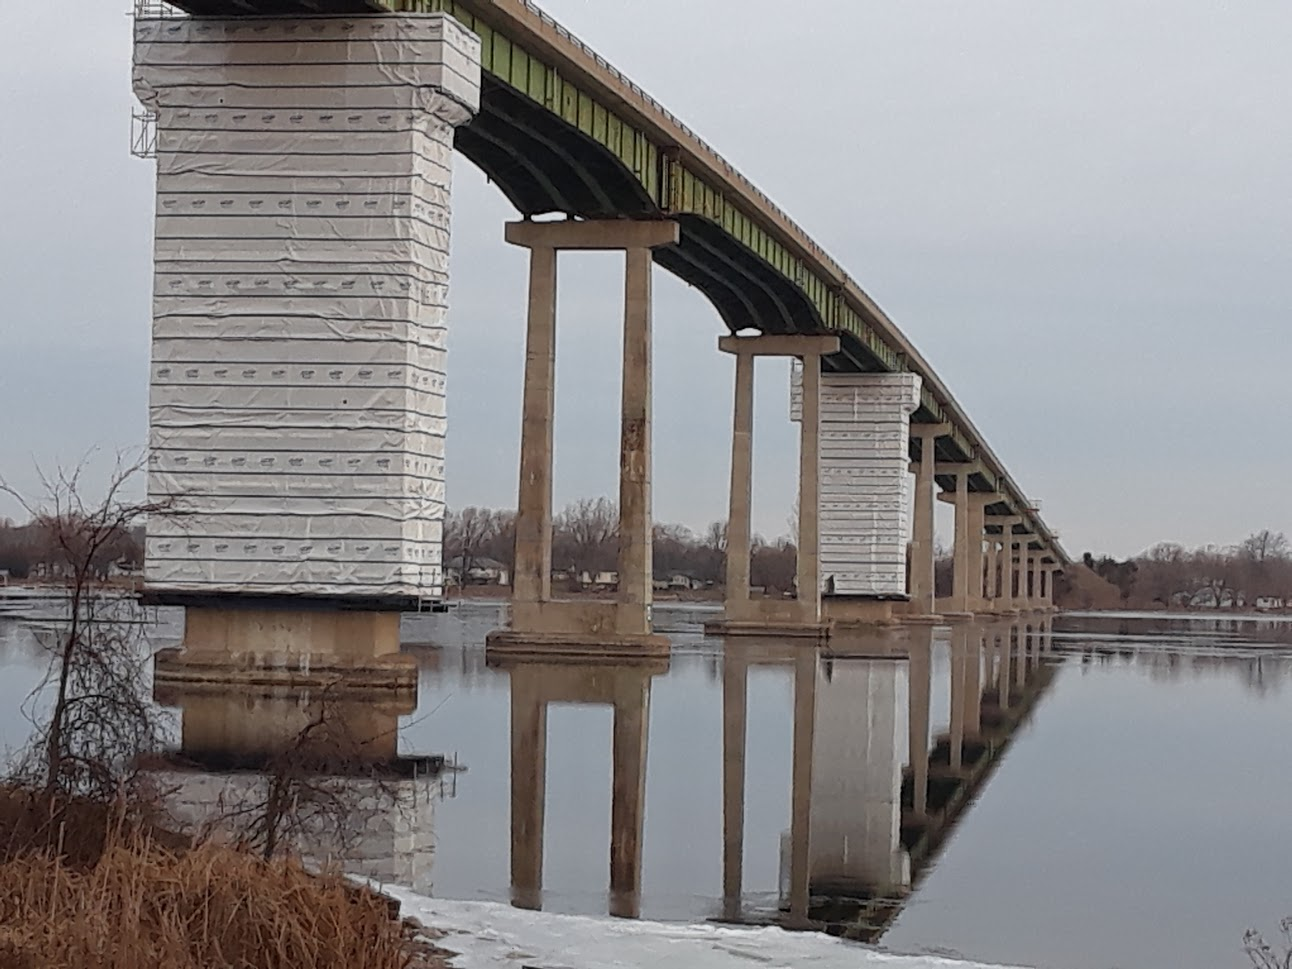 MTO updates Quinte Skyway Bridge rehabilitation project